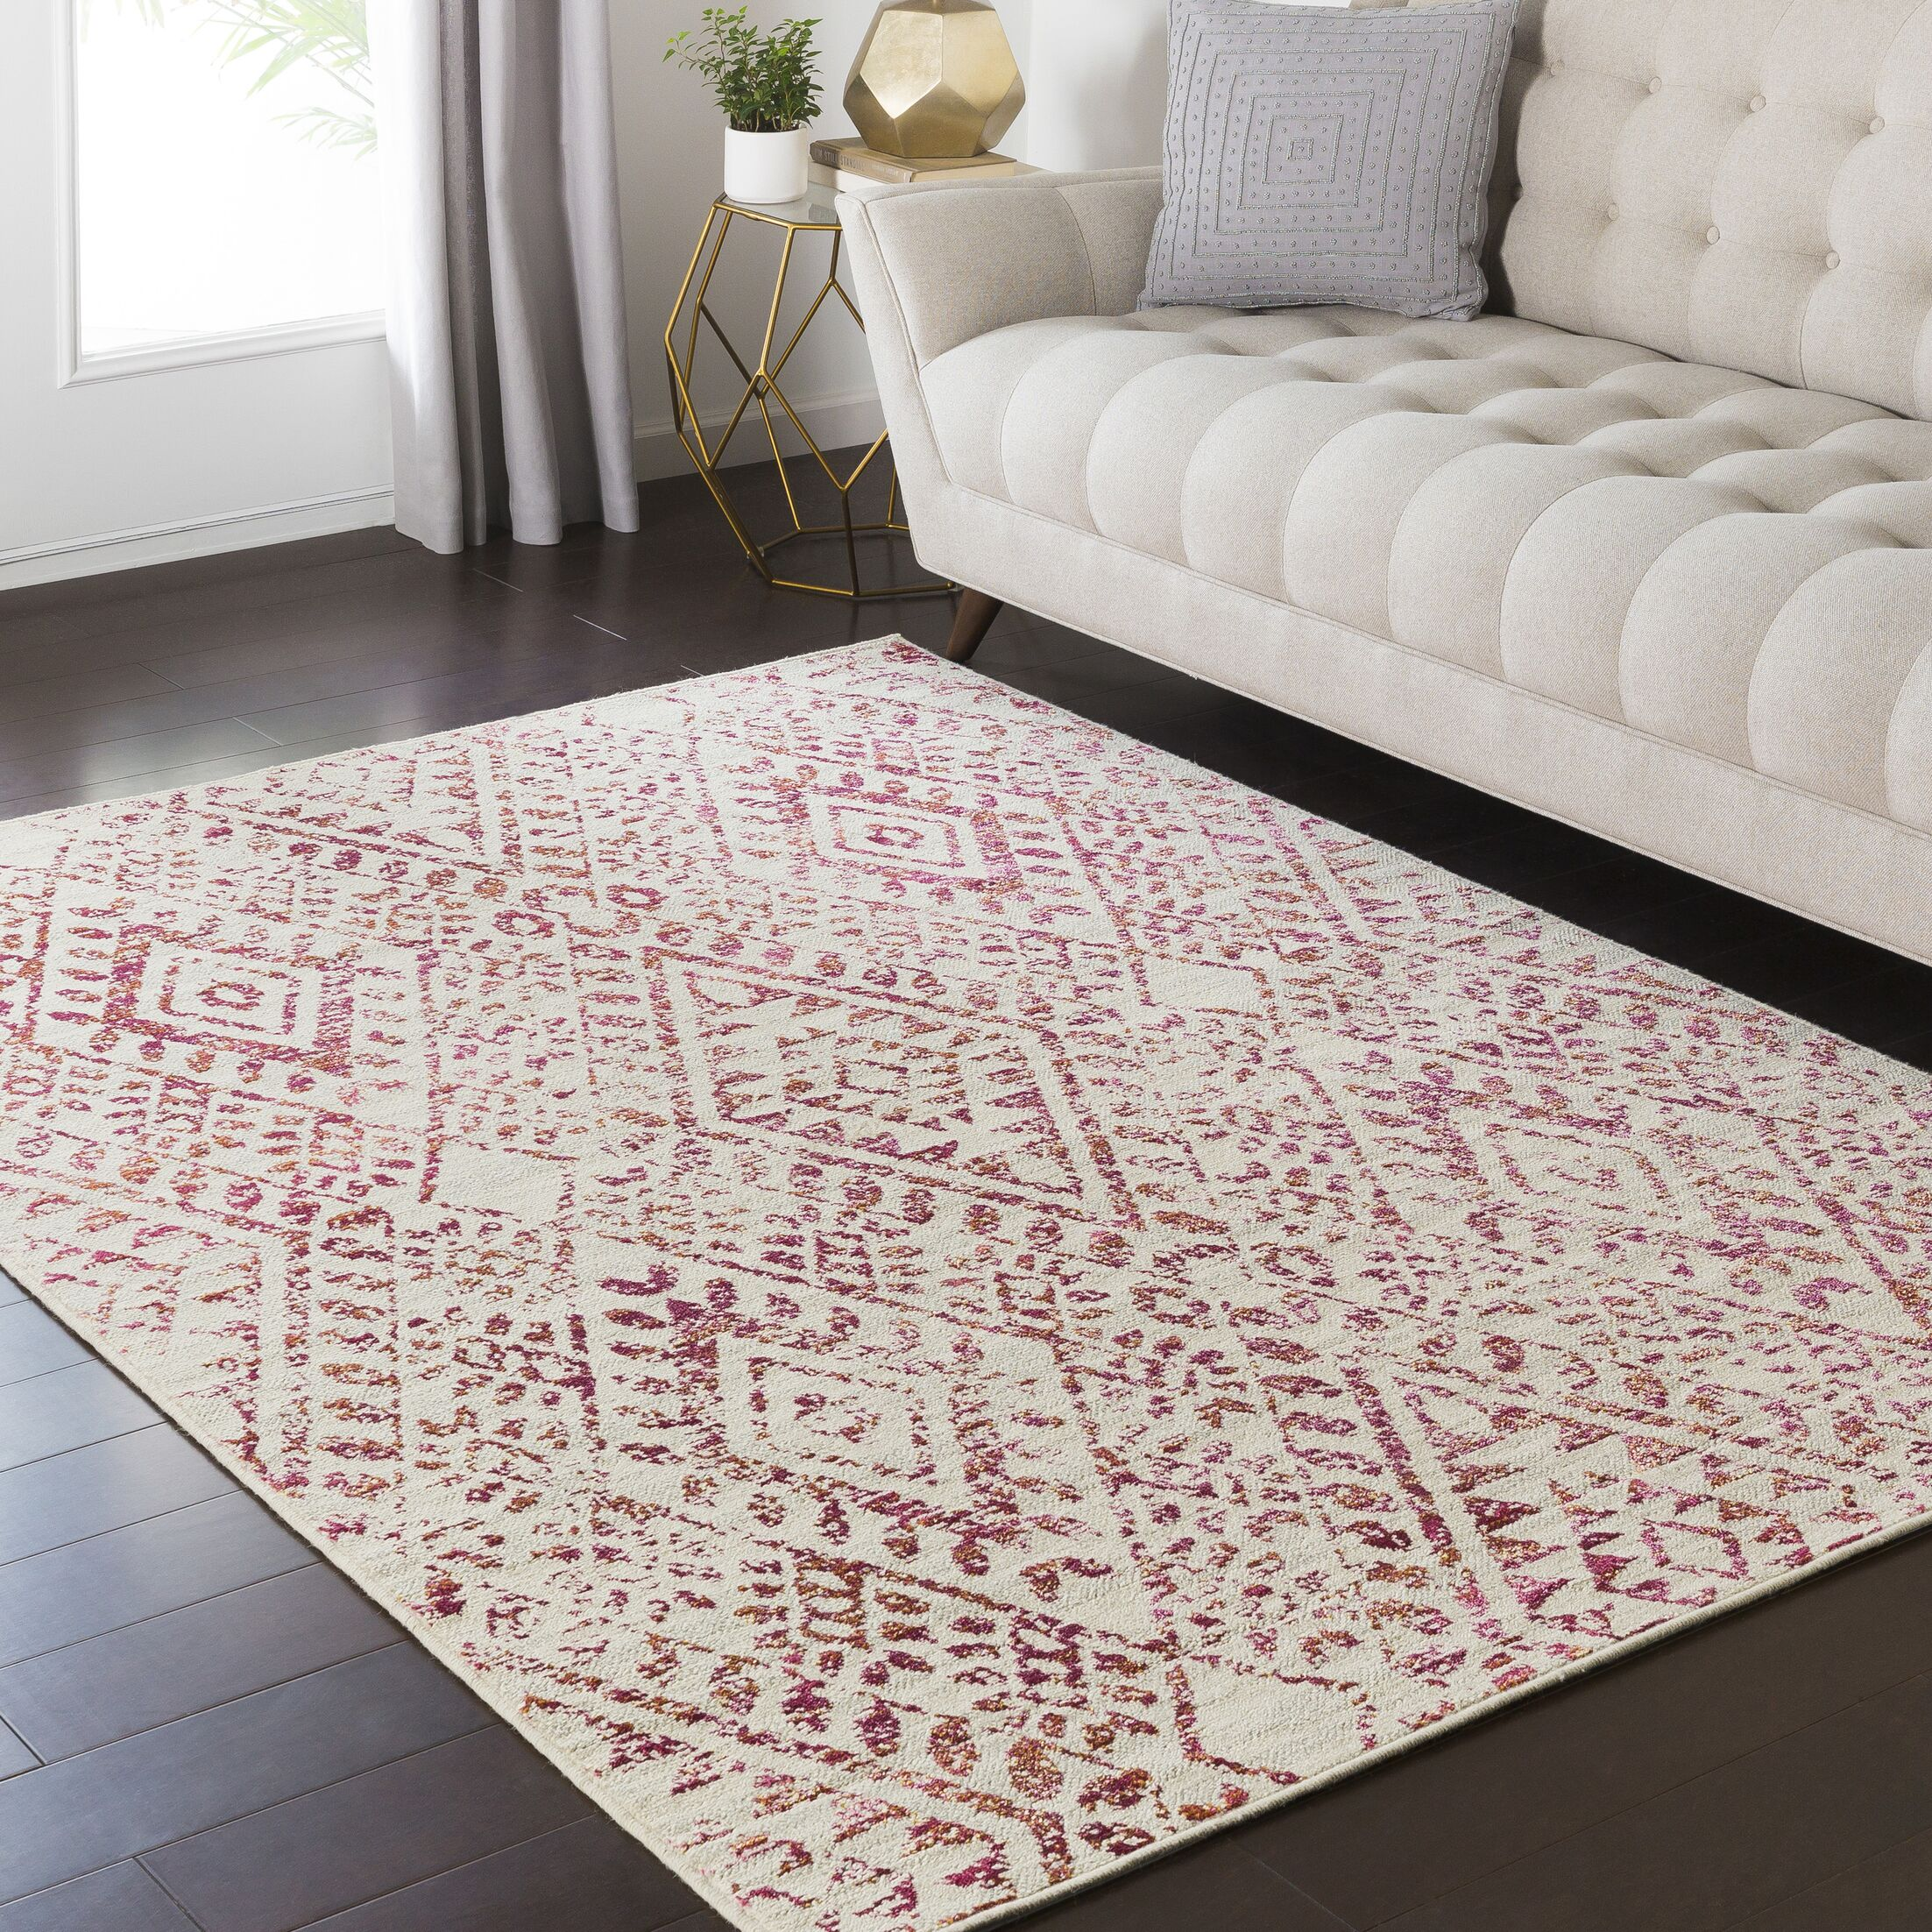 Puran Pink/Cream Area Rug Rug Size: Rectangle 7'10